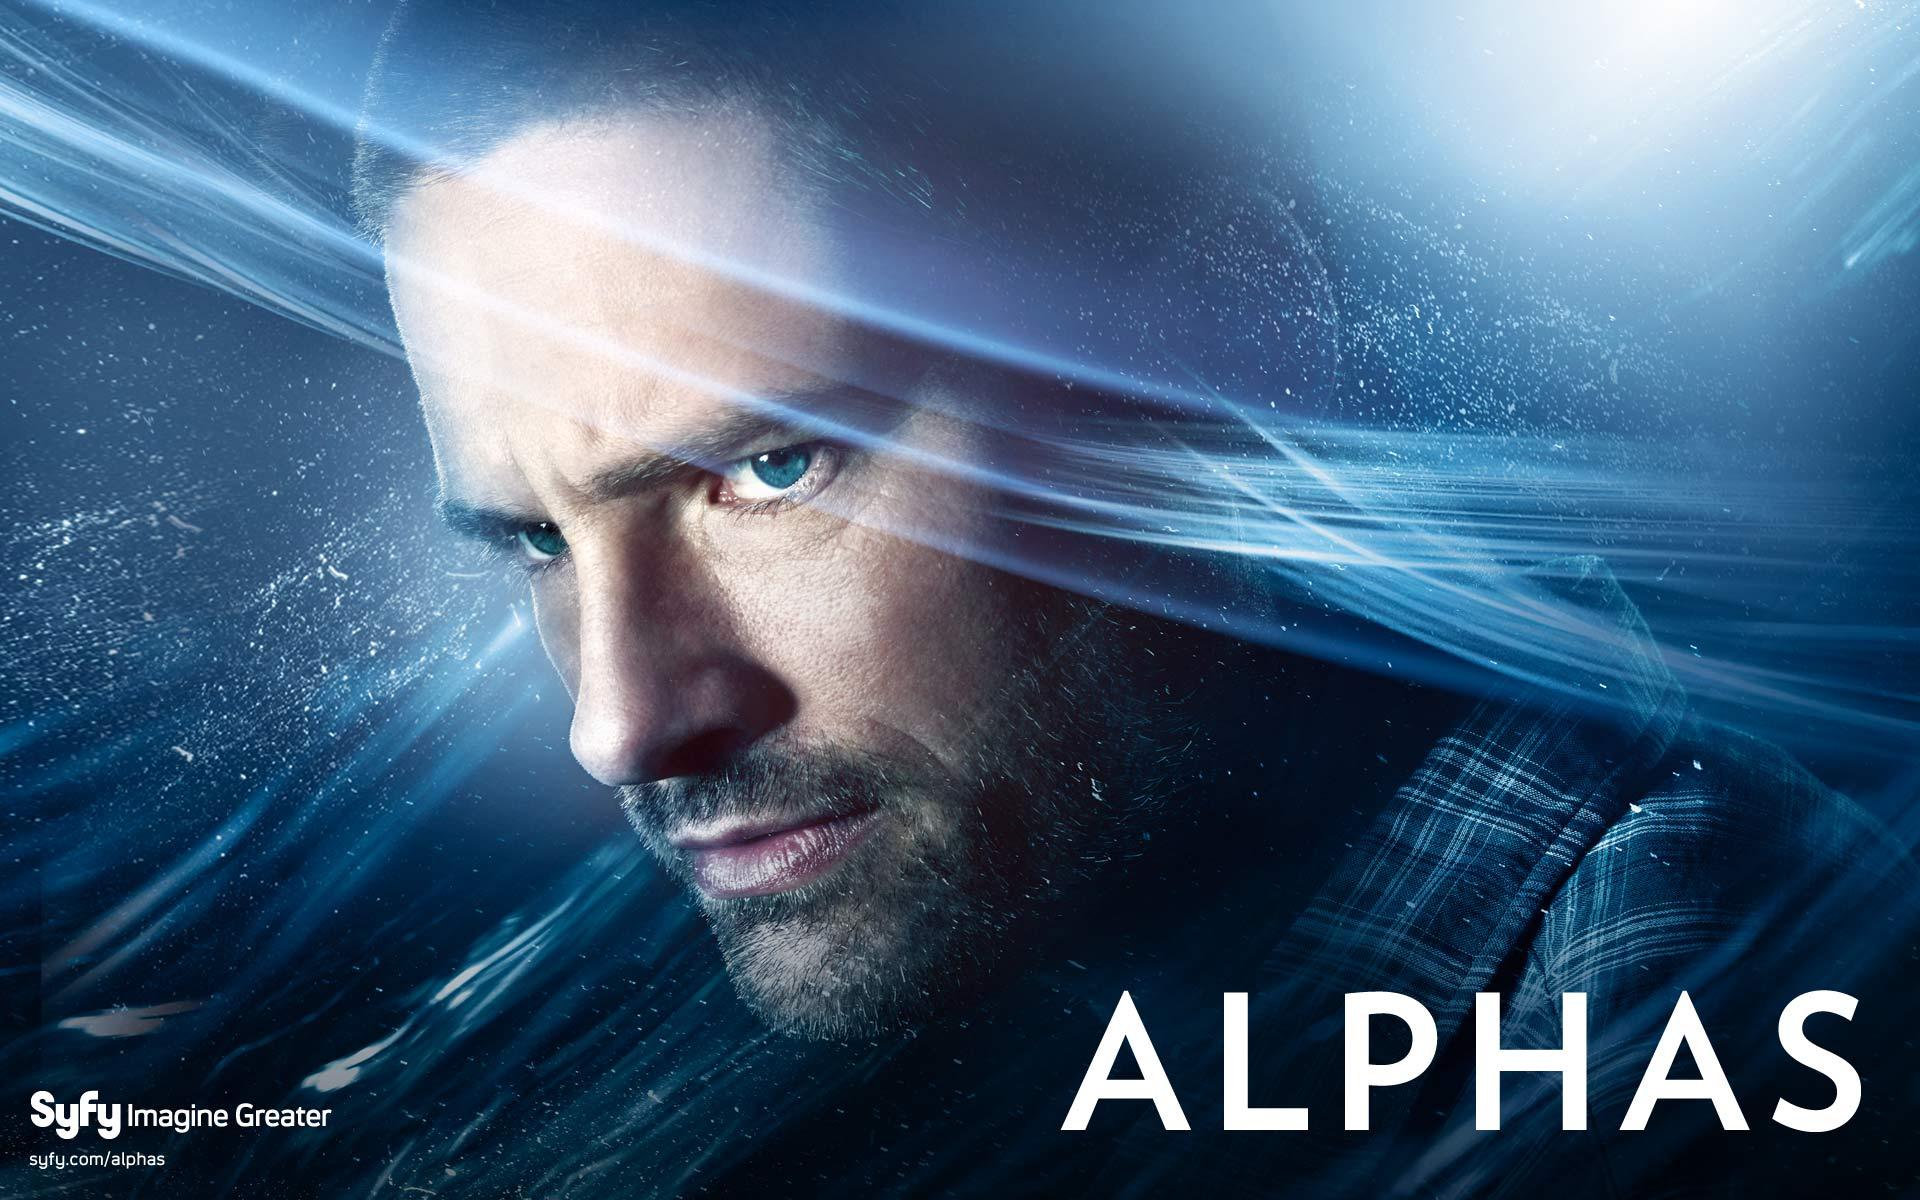 Alphas wallpaper 16